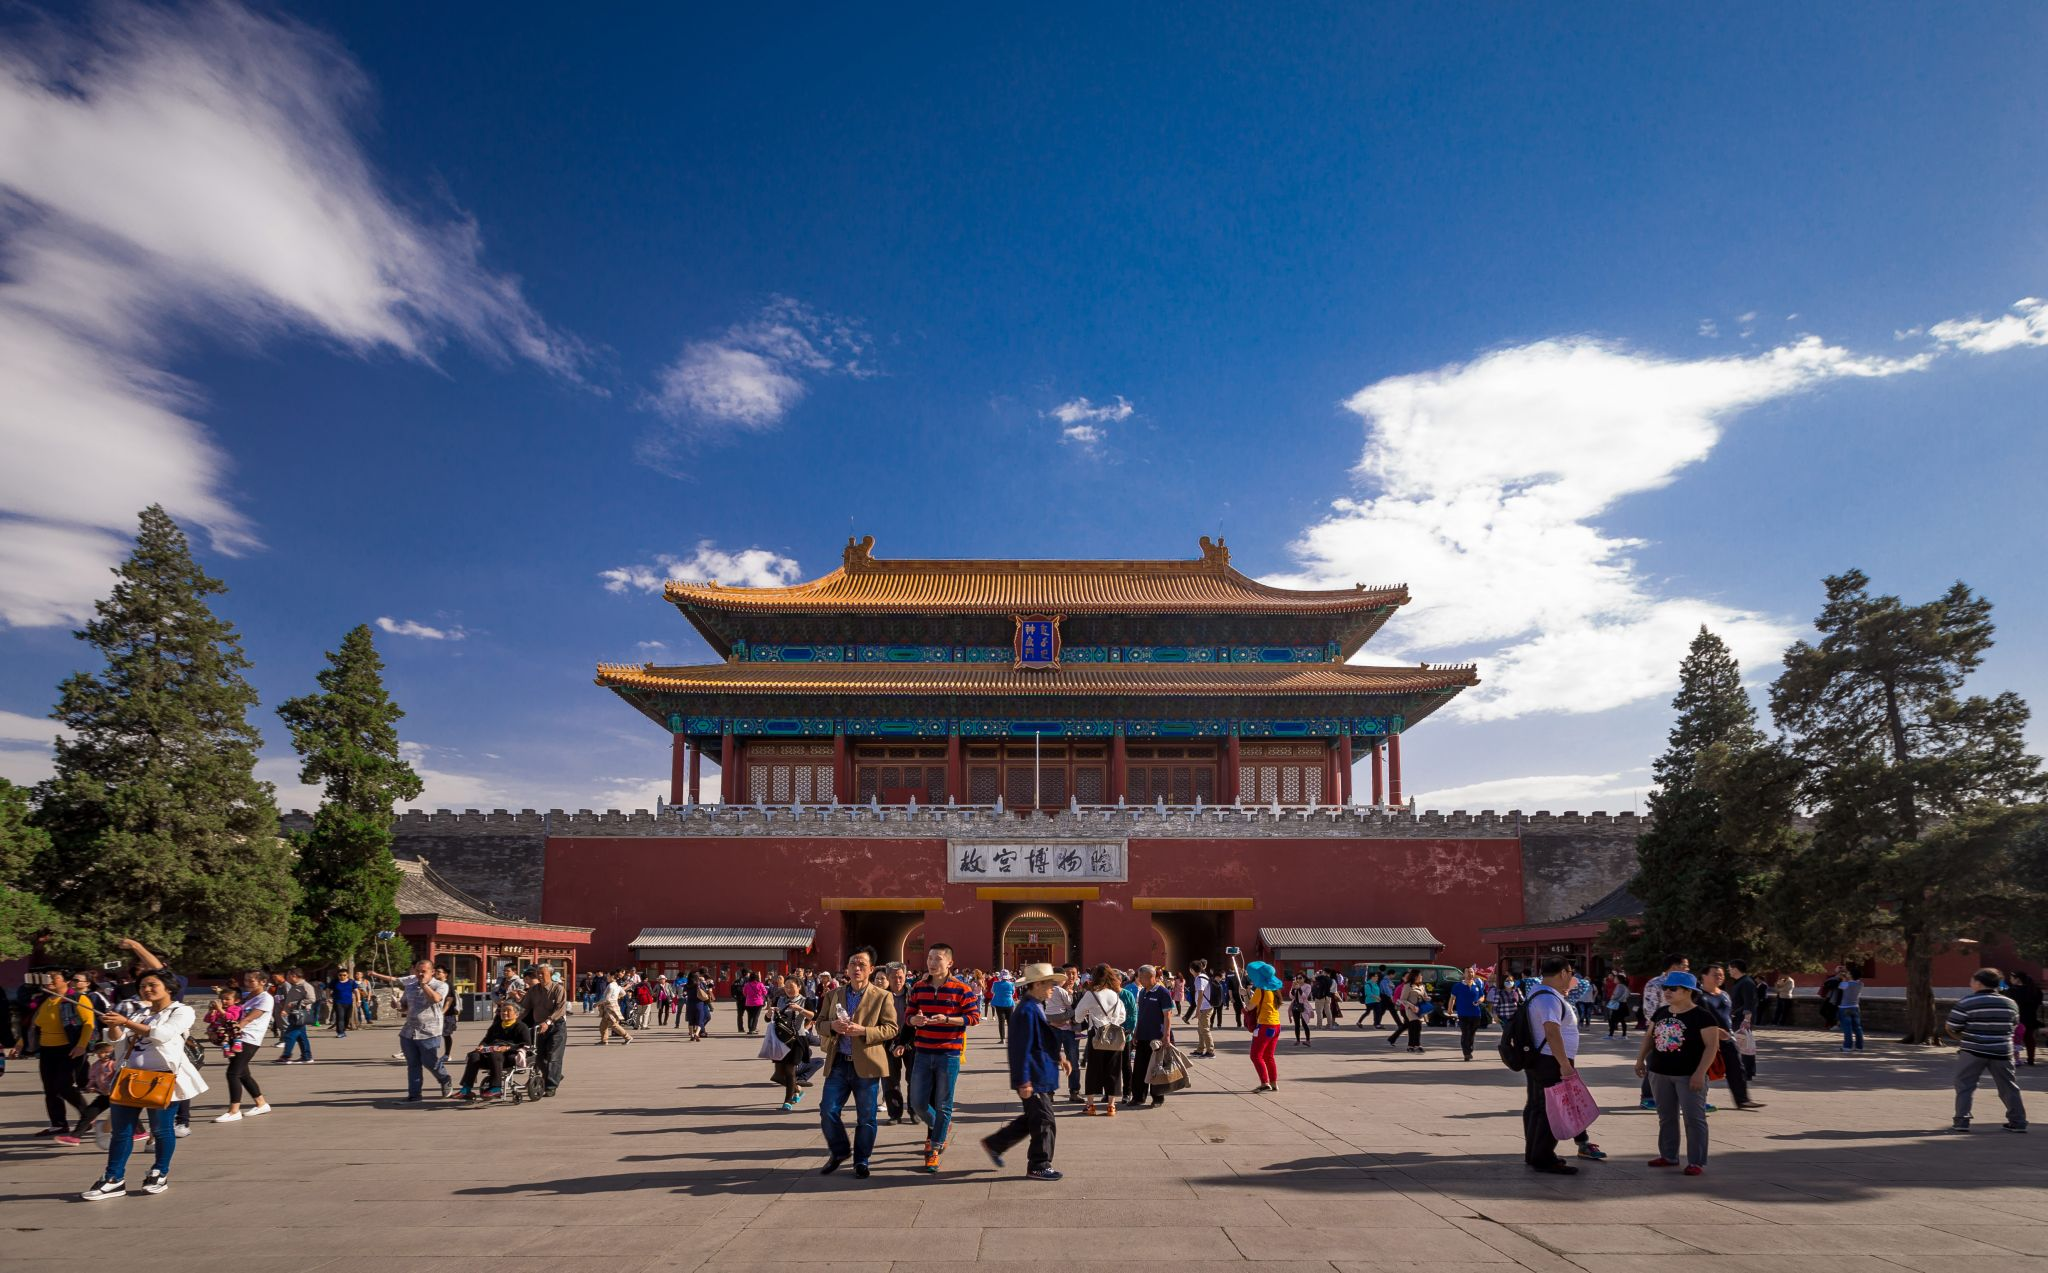 Shunzhen Gate - Forbidden City, China